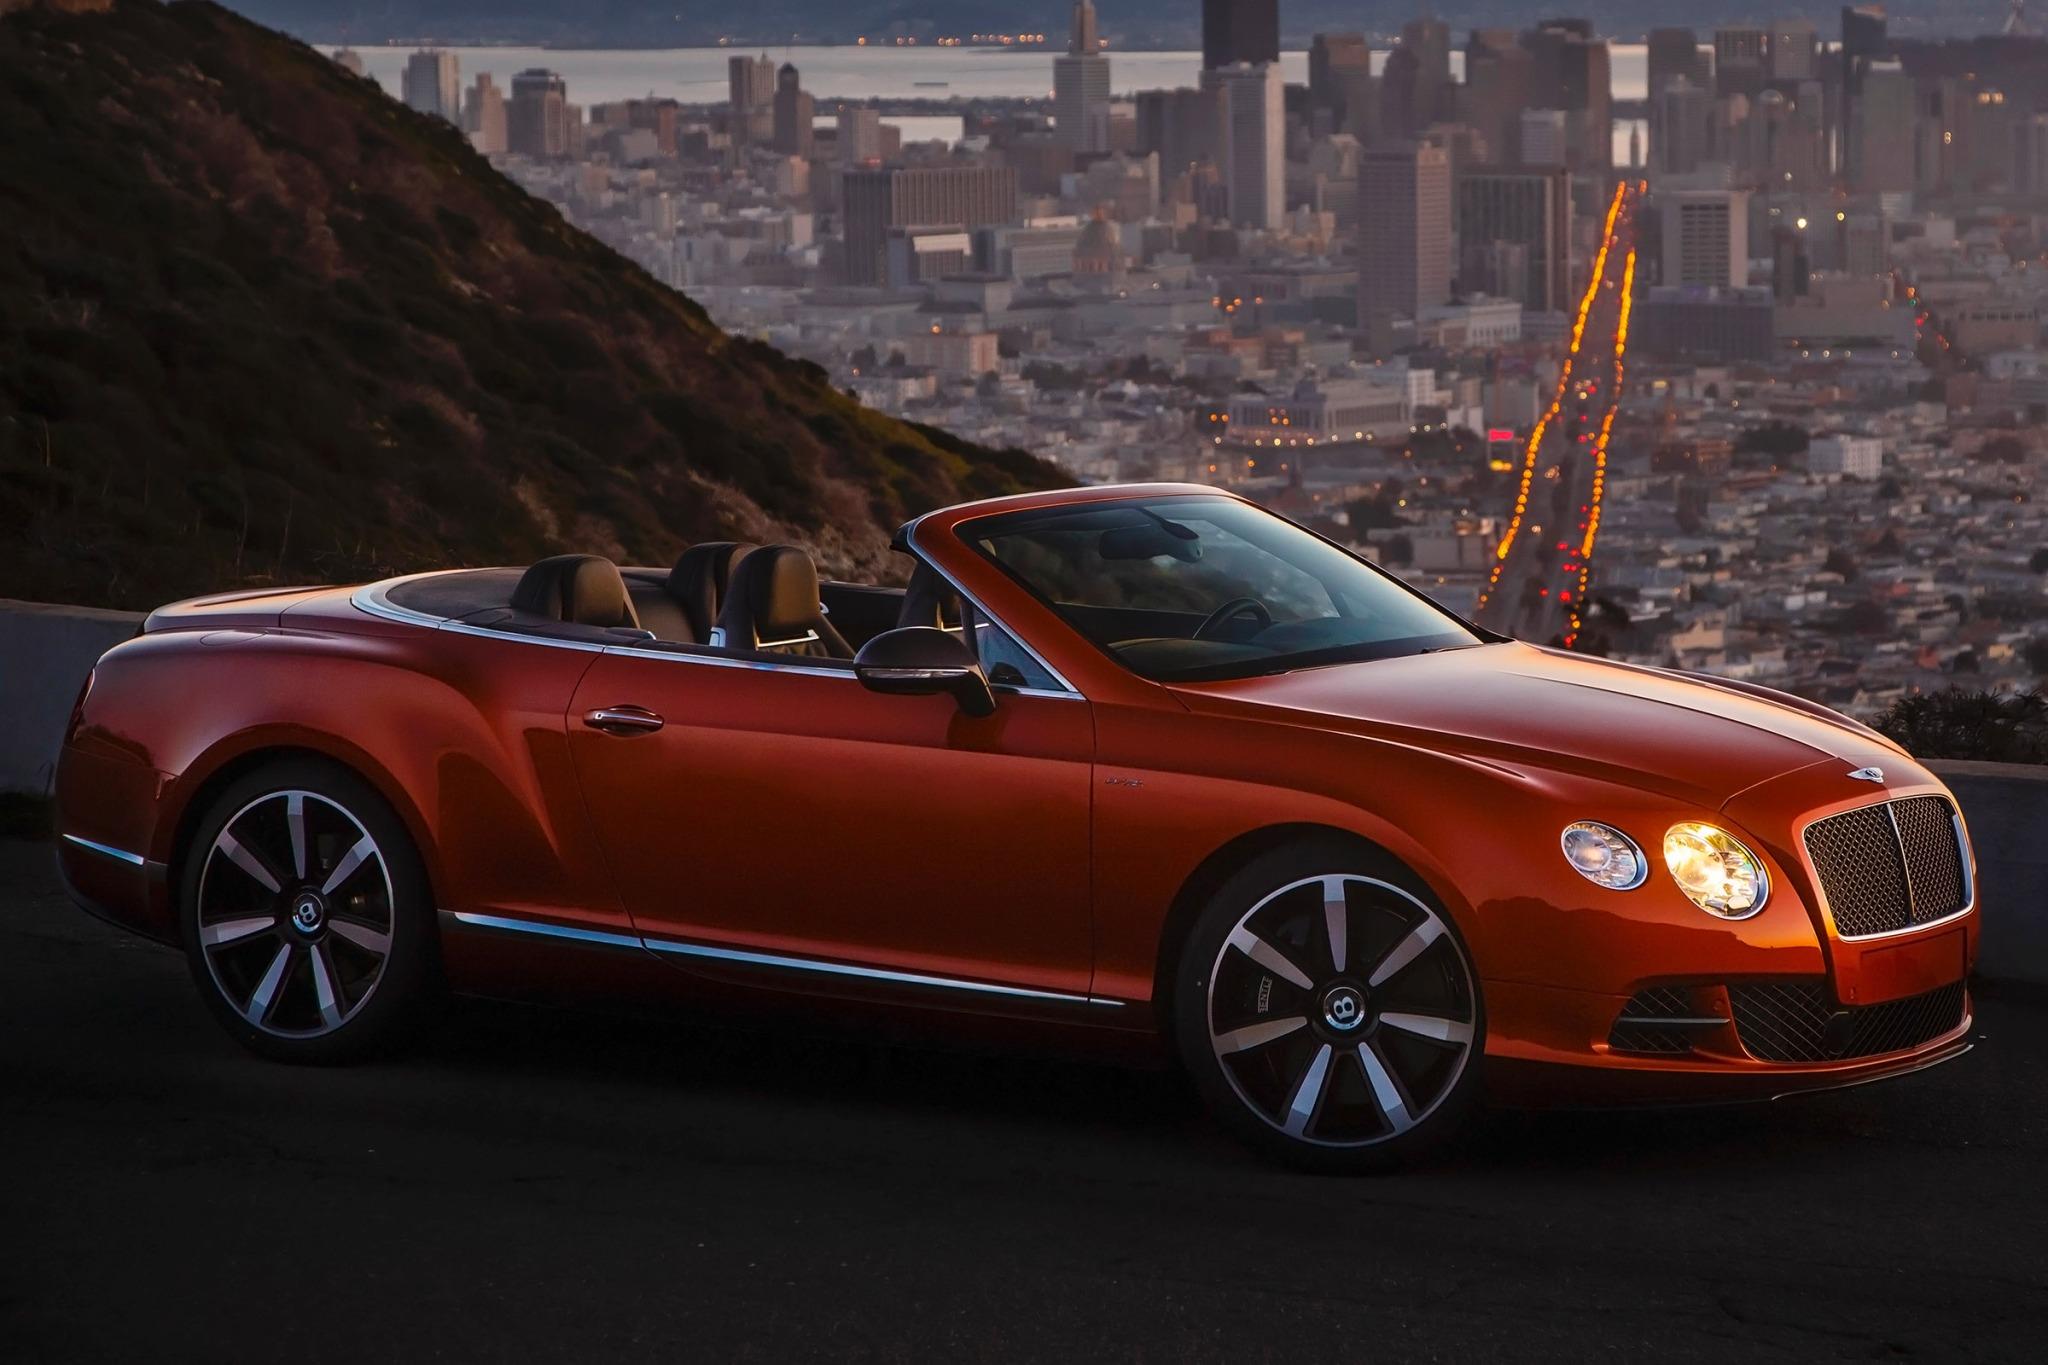 2014 Bentley Continental Gt Speed Convertible Image 2